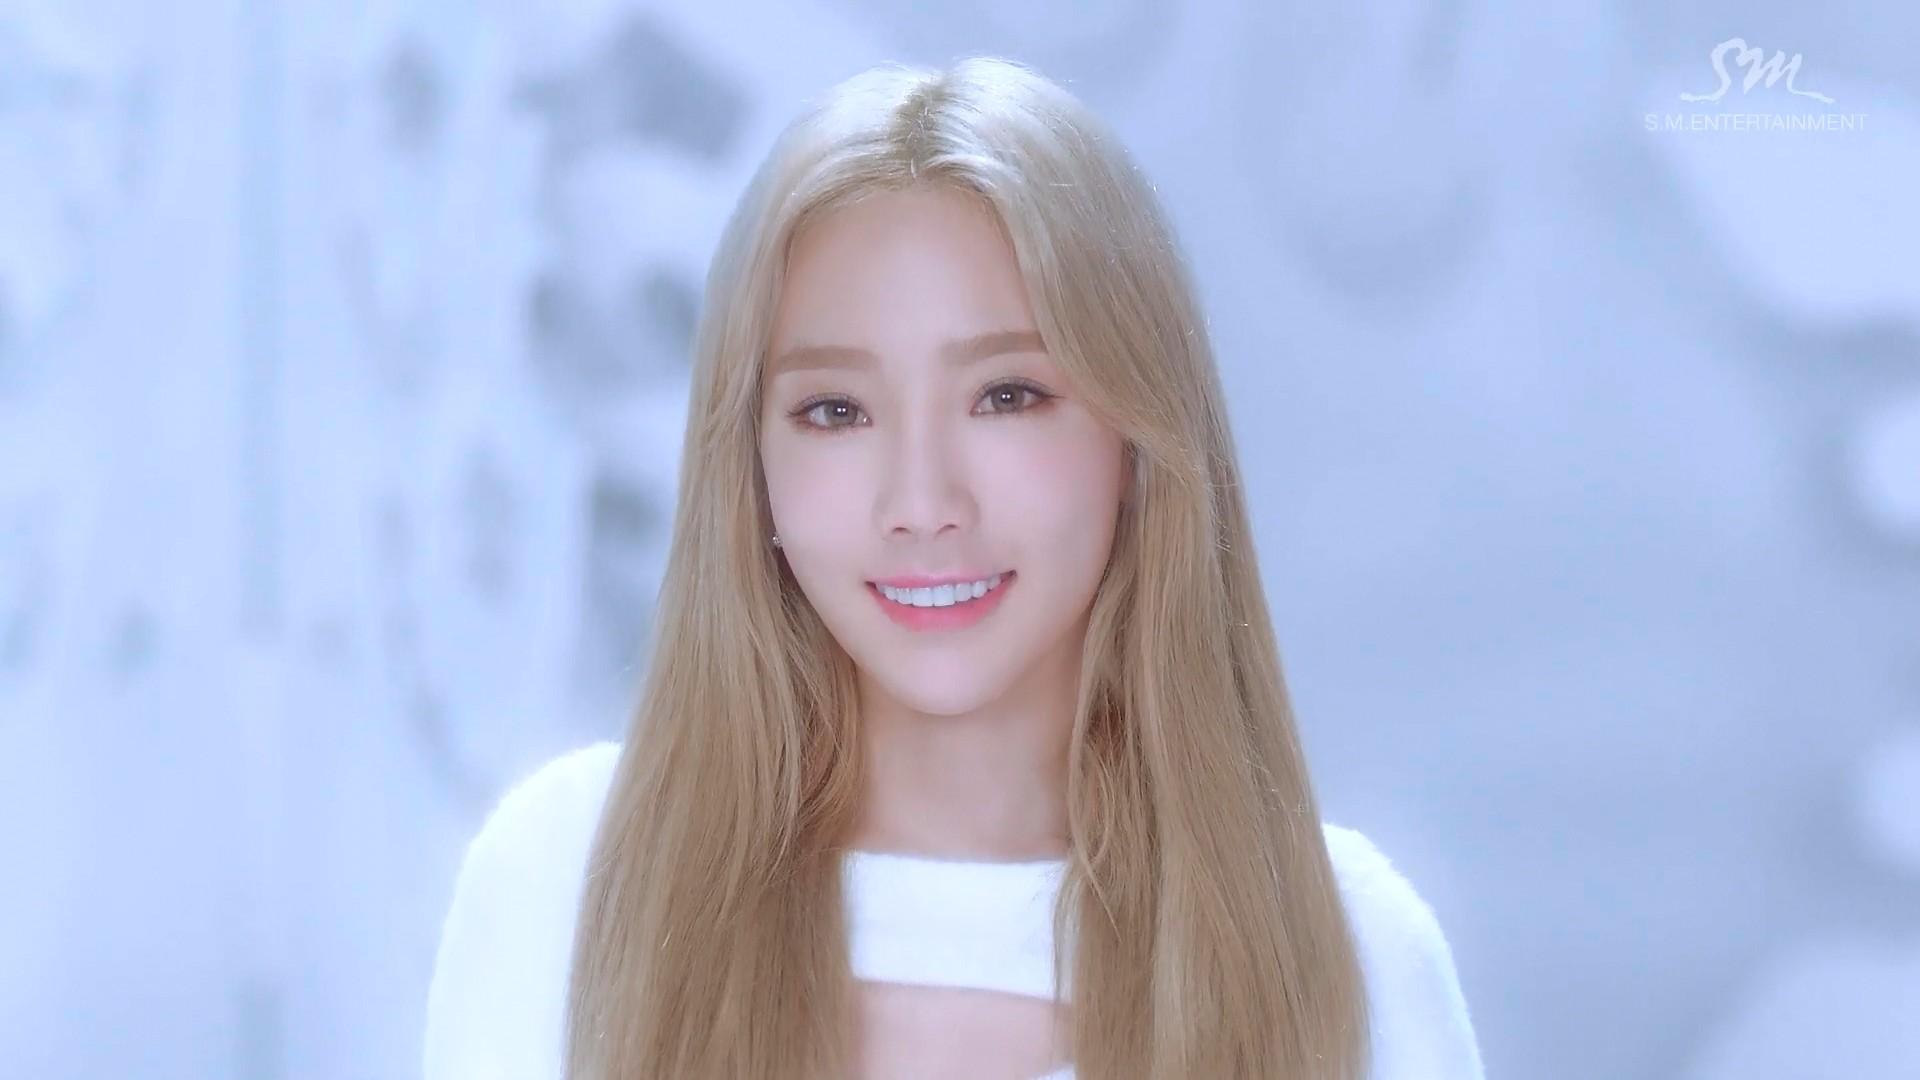 Download Music Video File: [MV] Girls' Generation-TTS – Dear Santa (English  Ver.) [Naver HD 1080p] Size: 131 MiB. Hosted: MF + Mega